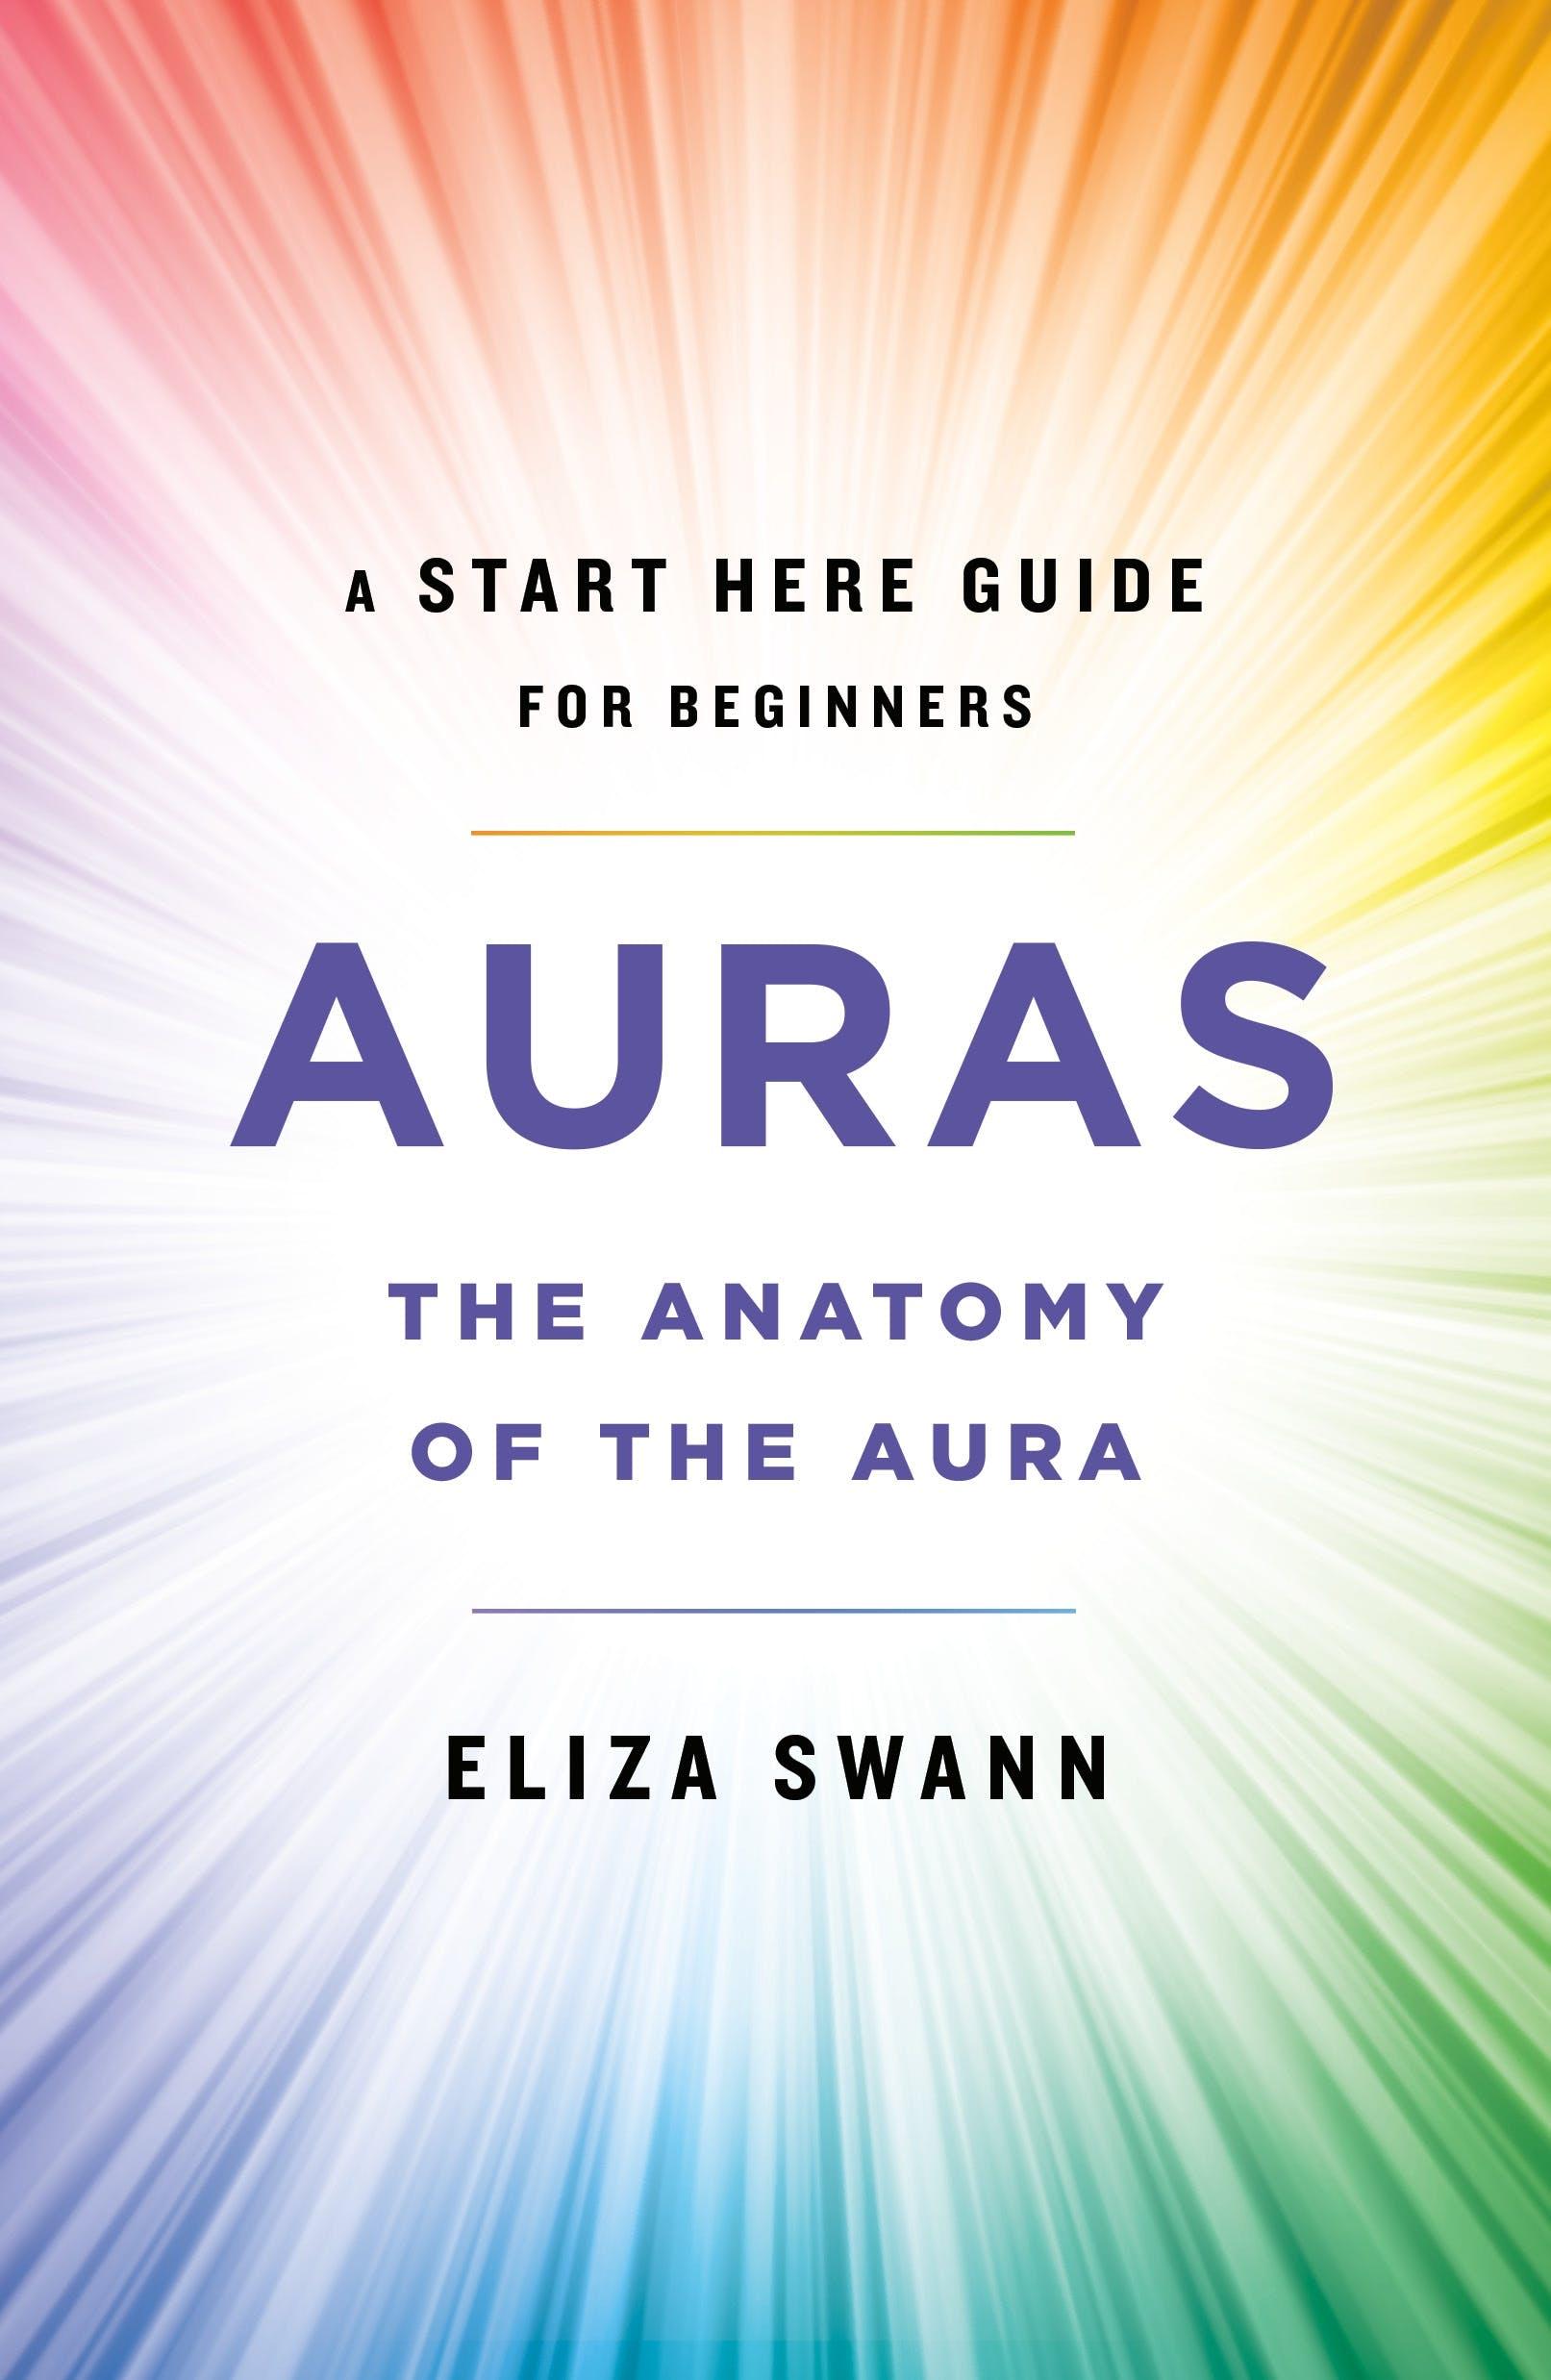 Image of Auras